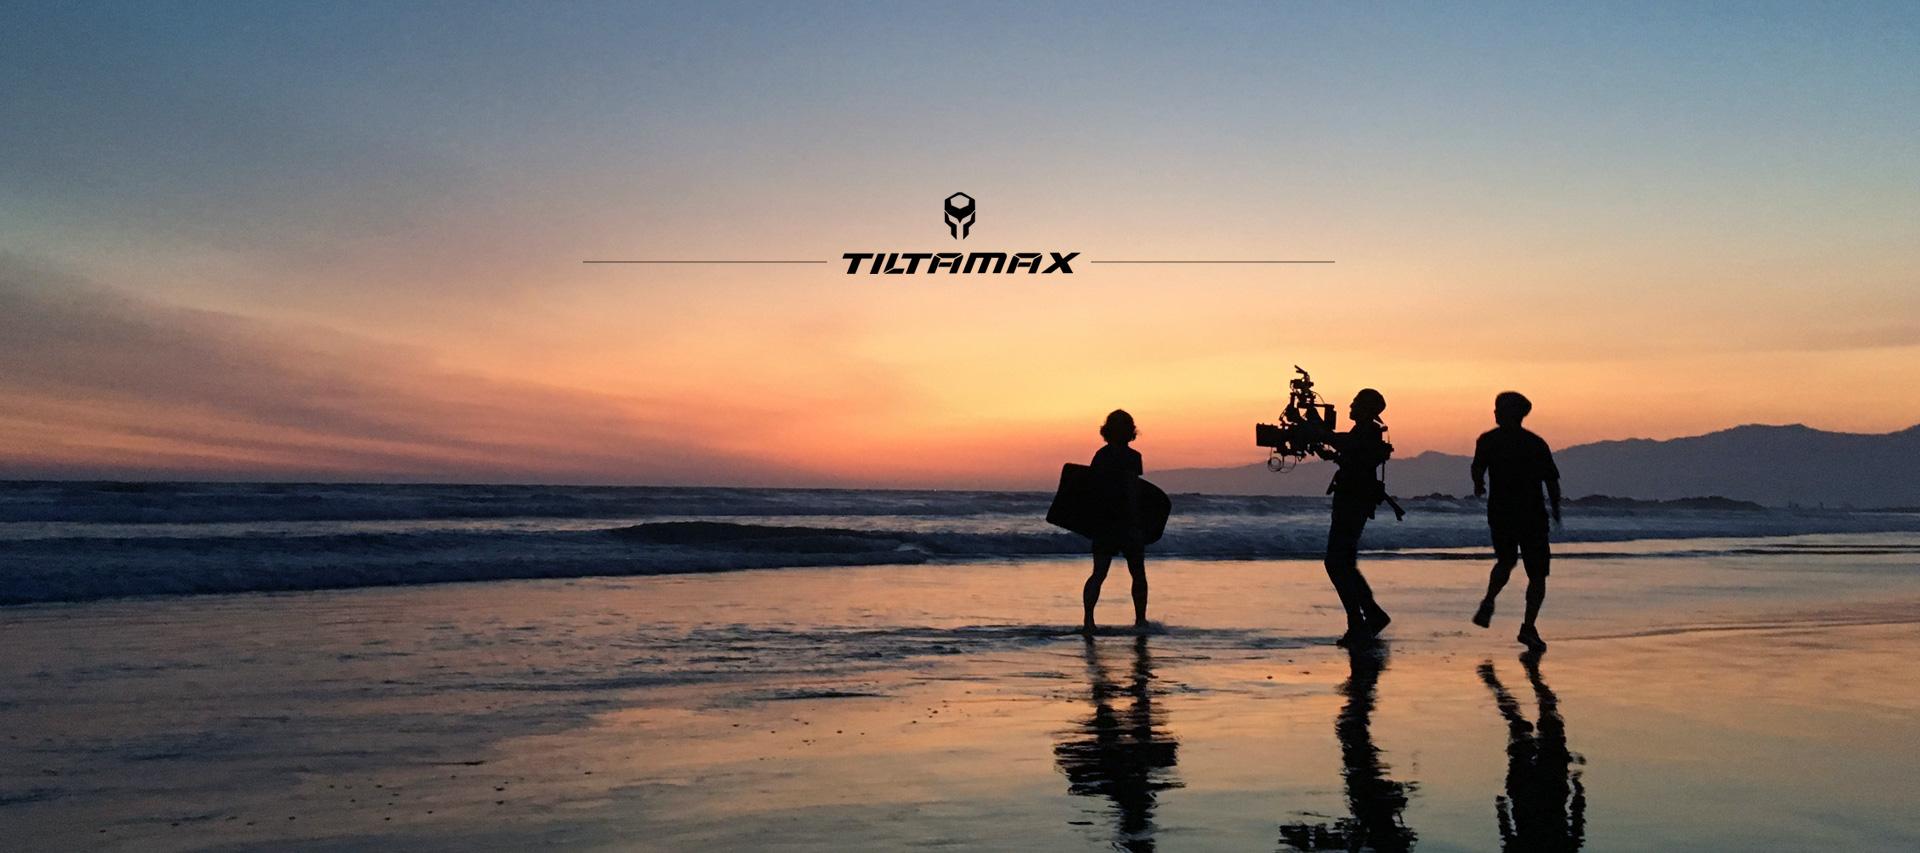 tiltamax-dravity-armor-003